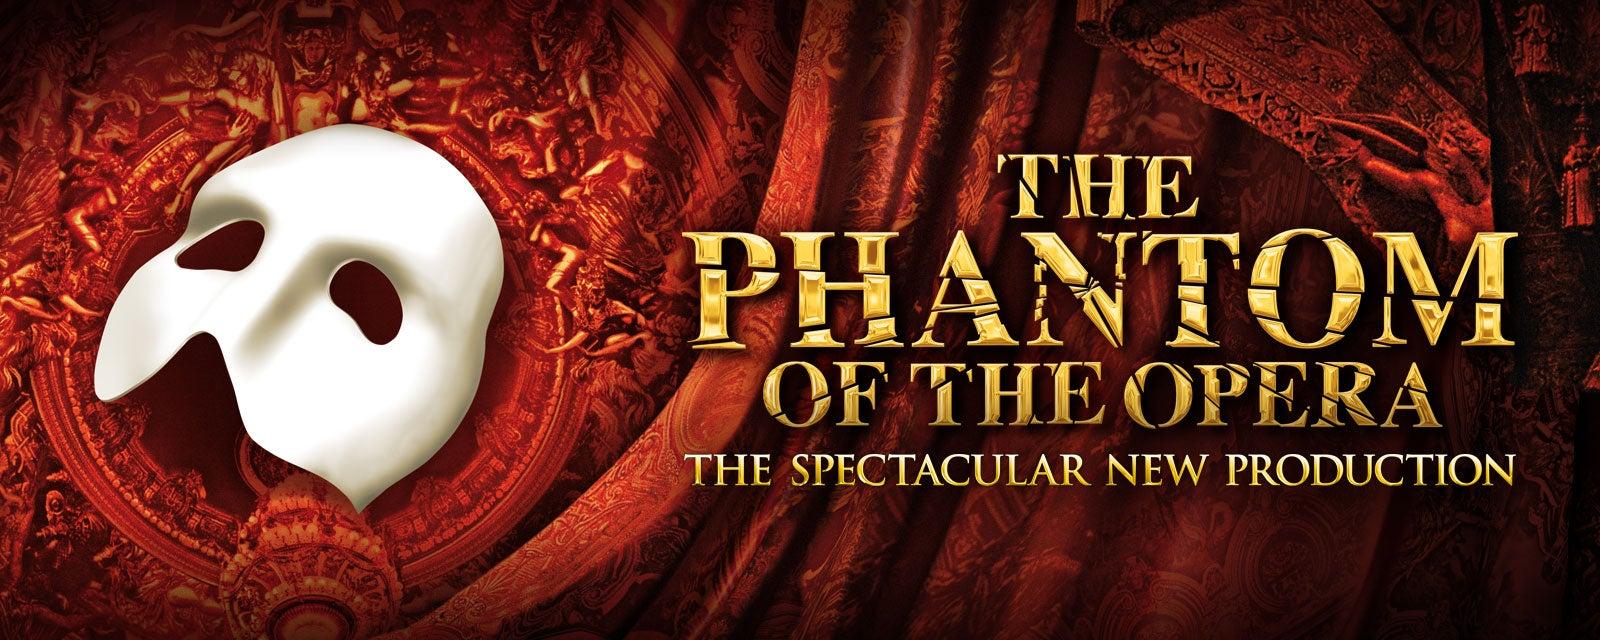 the phantom of the opera torrent